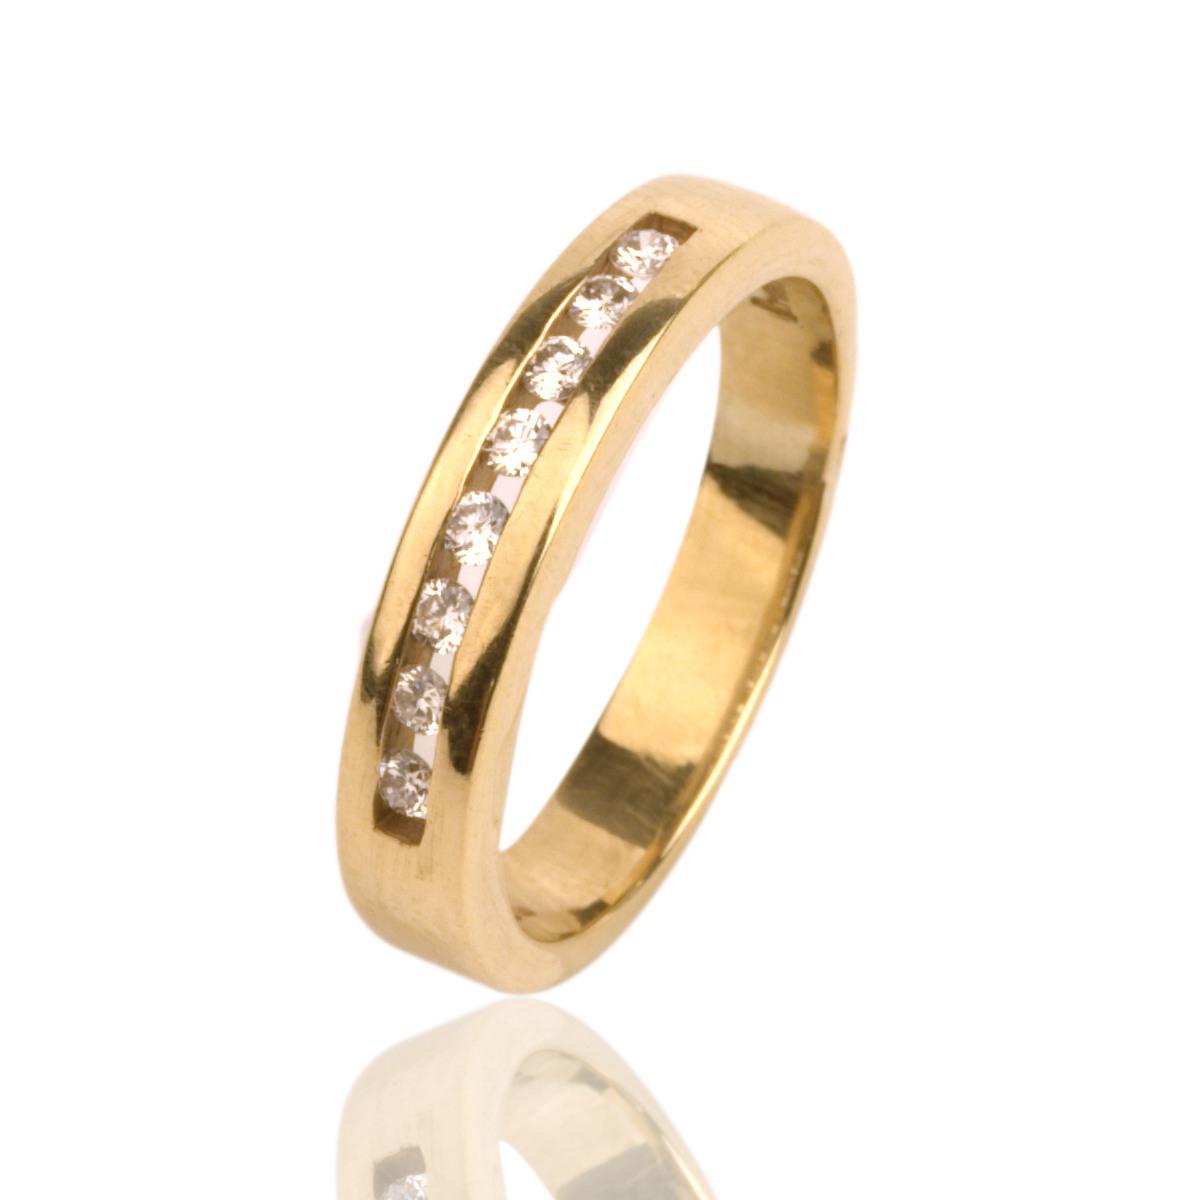 Christ Band Verlobungsring 14 Kt. Gold Ehering 585Er Gelbgold Damen Ring  Marken | Ebay